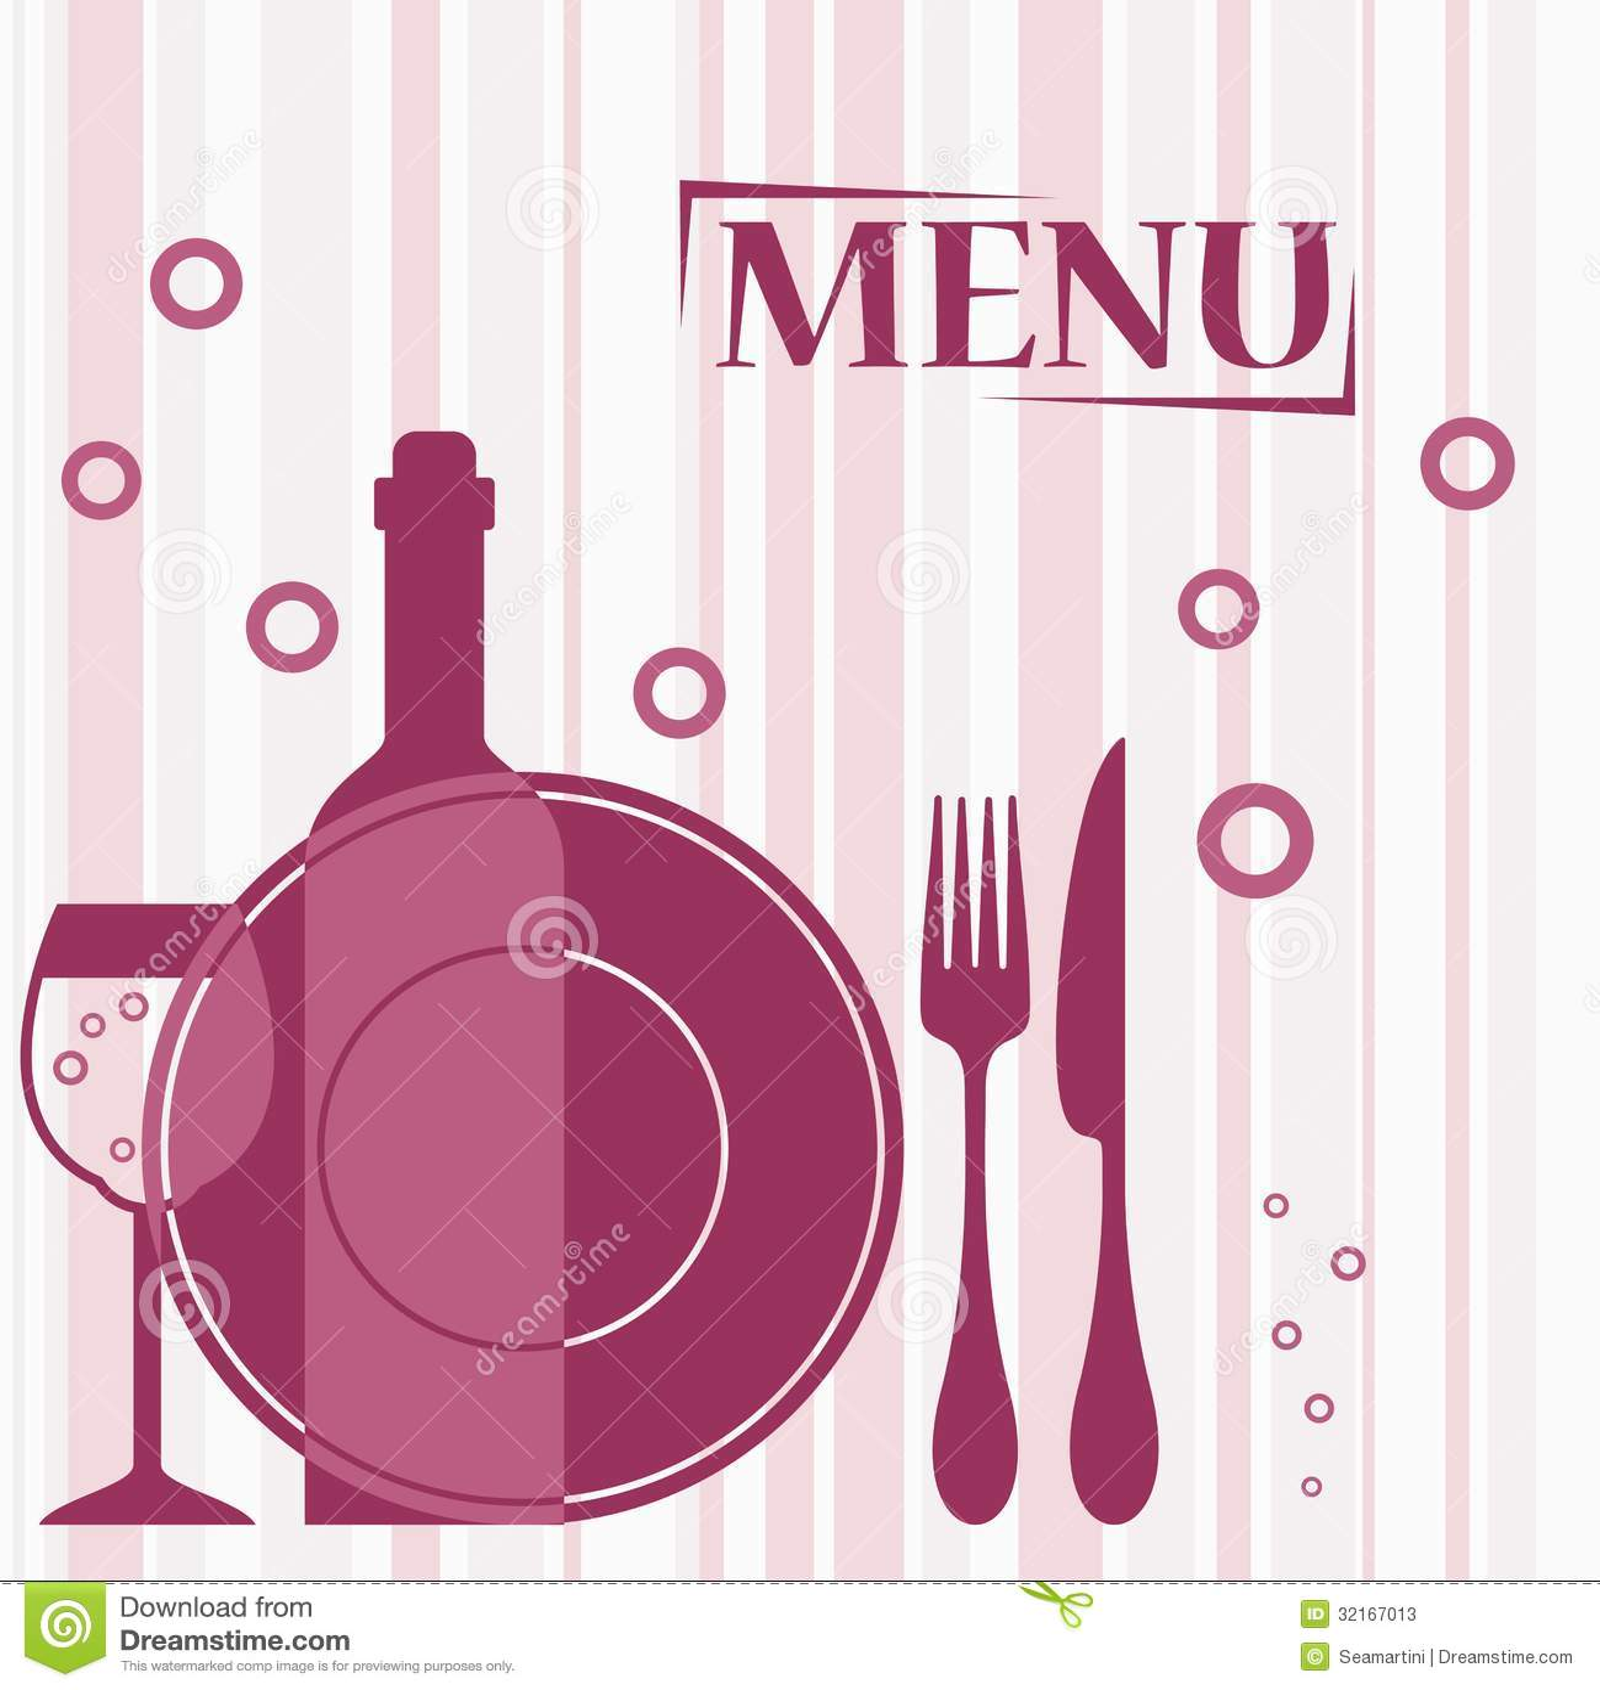 purple background for cafe menu design stock photos - image: 32167013